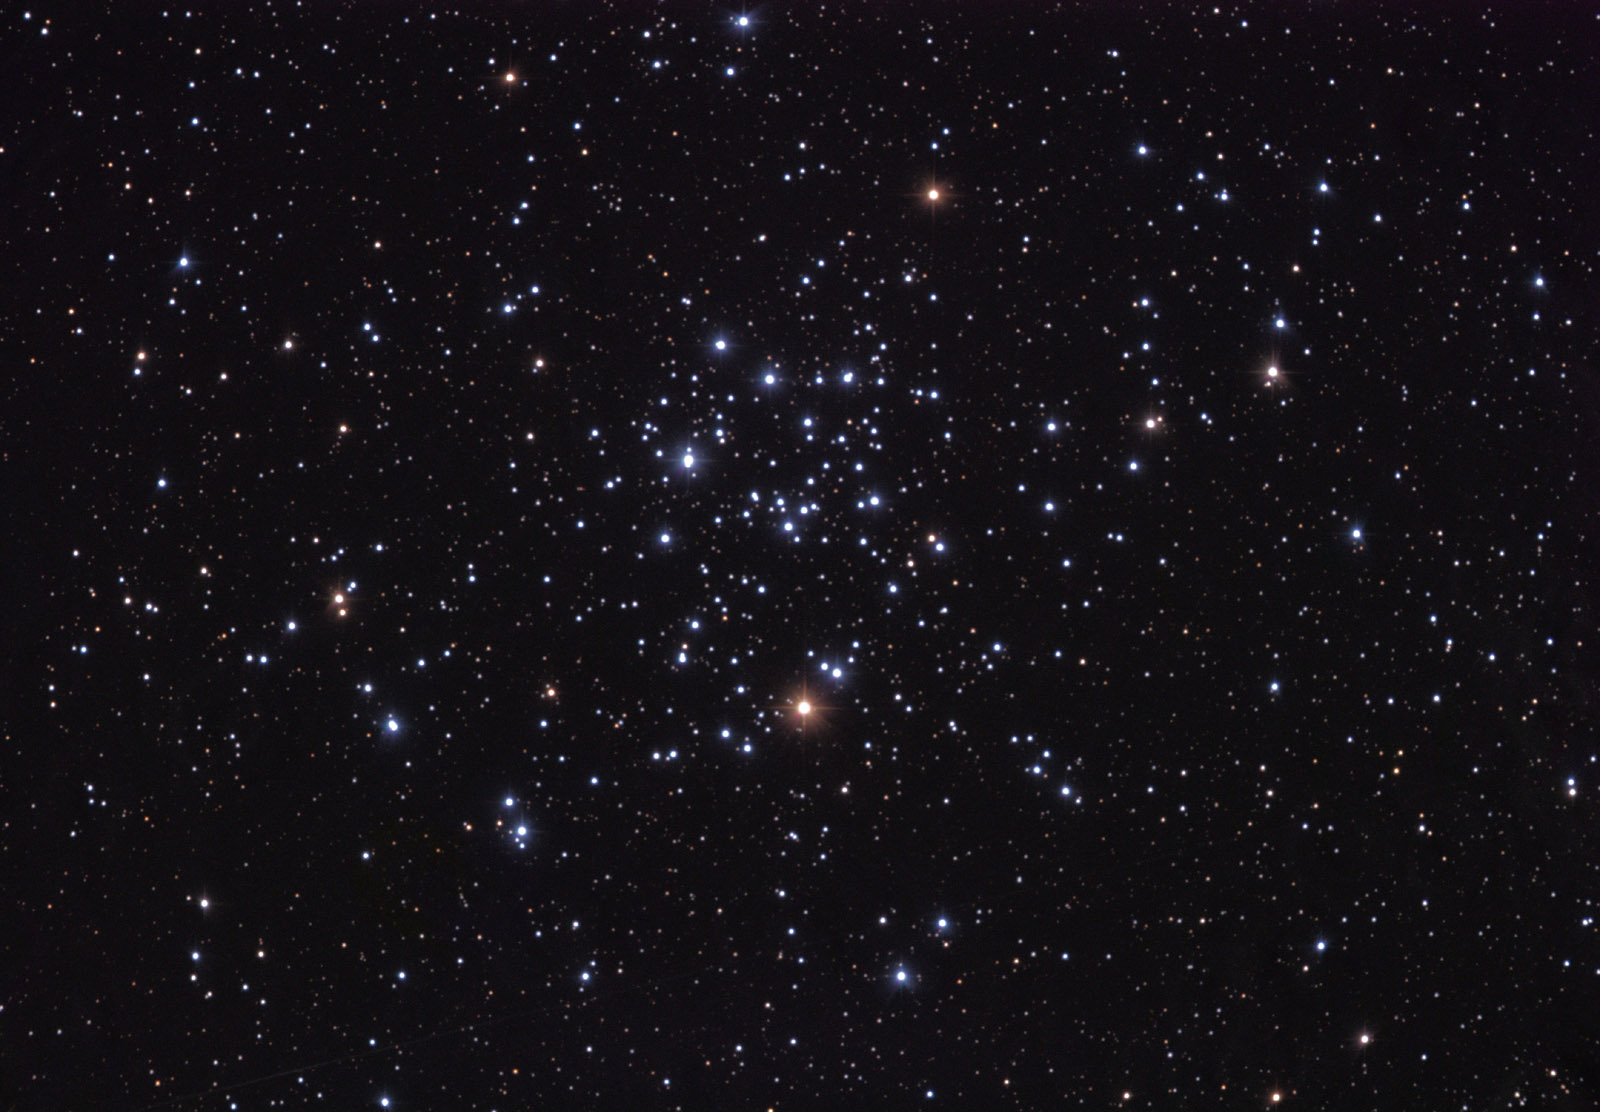 Os Extraterrestres podem estar a comunicar-se connosco através das estrelas